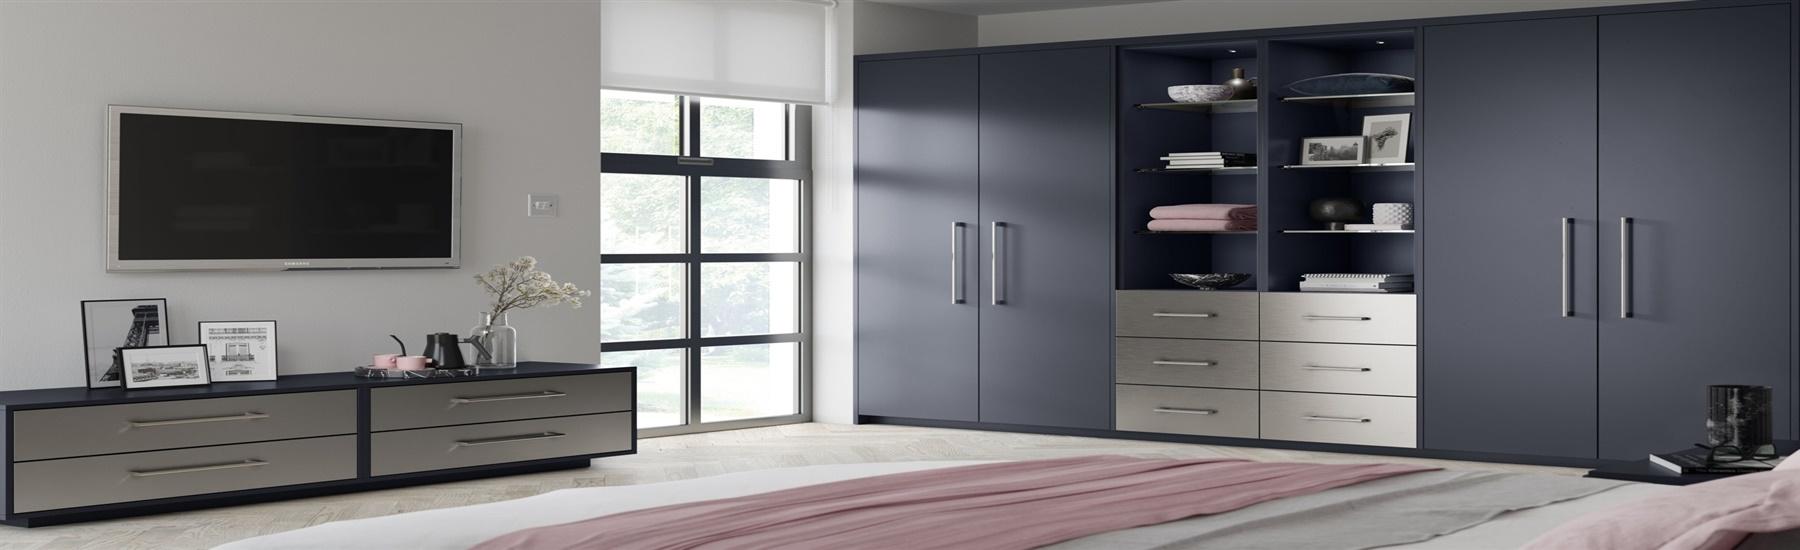 zurfiz-matt-wardrobe-doors